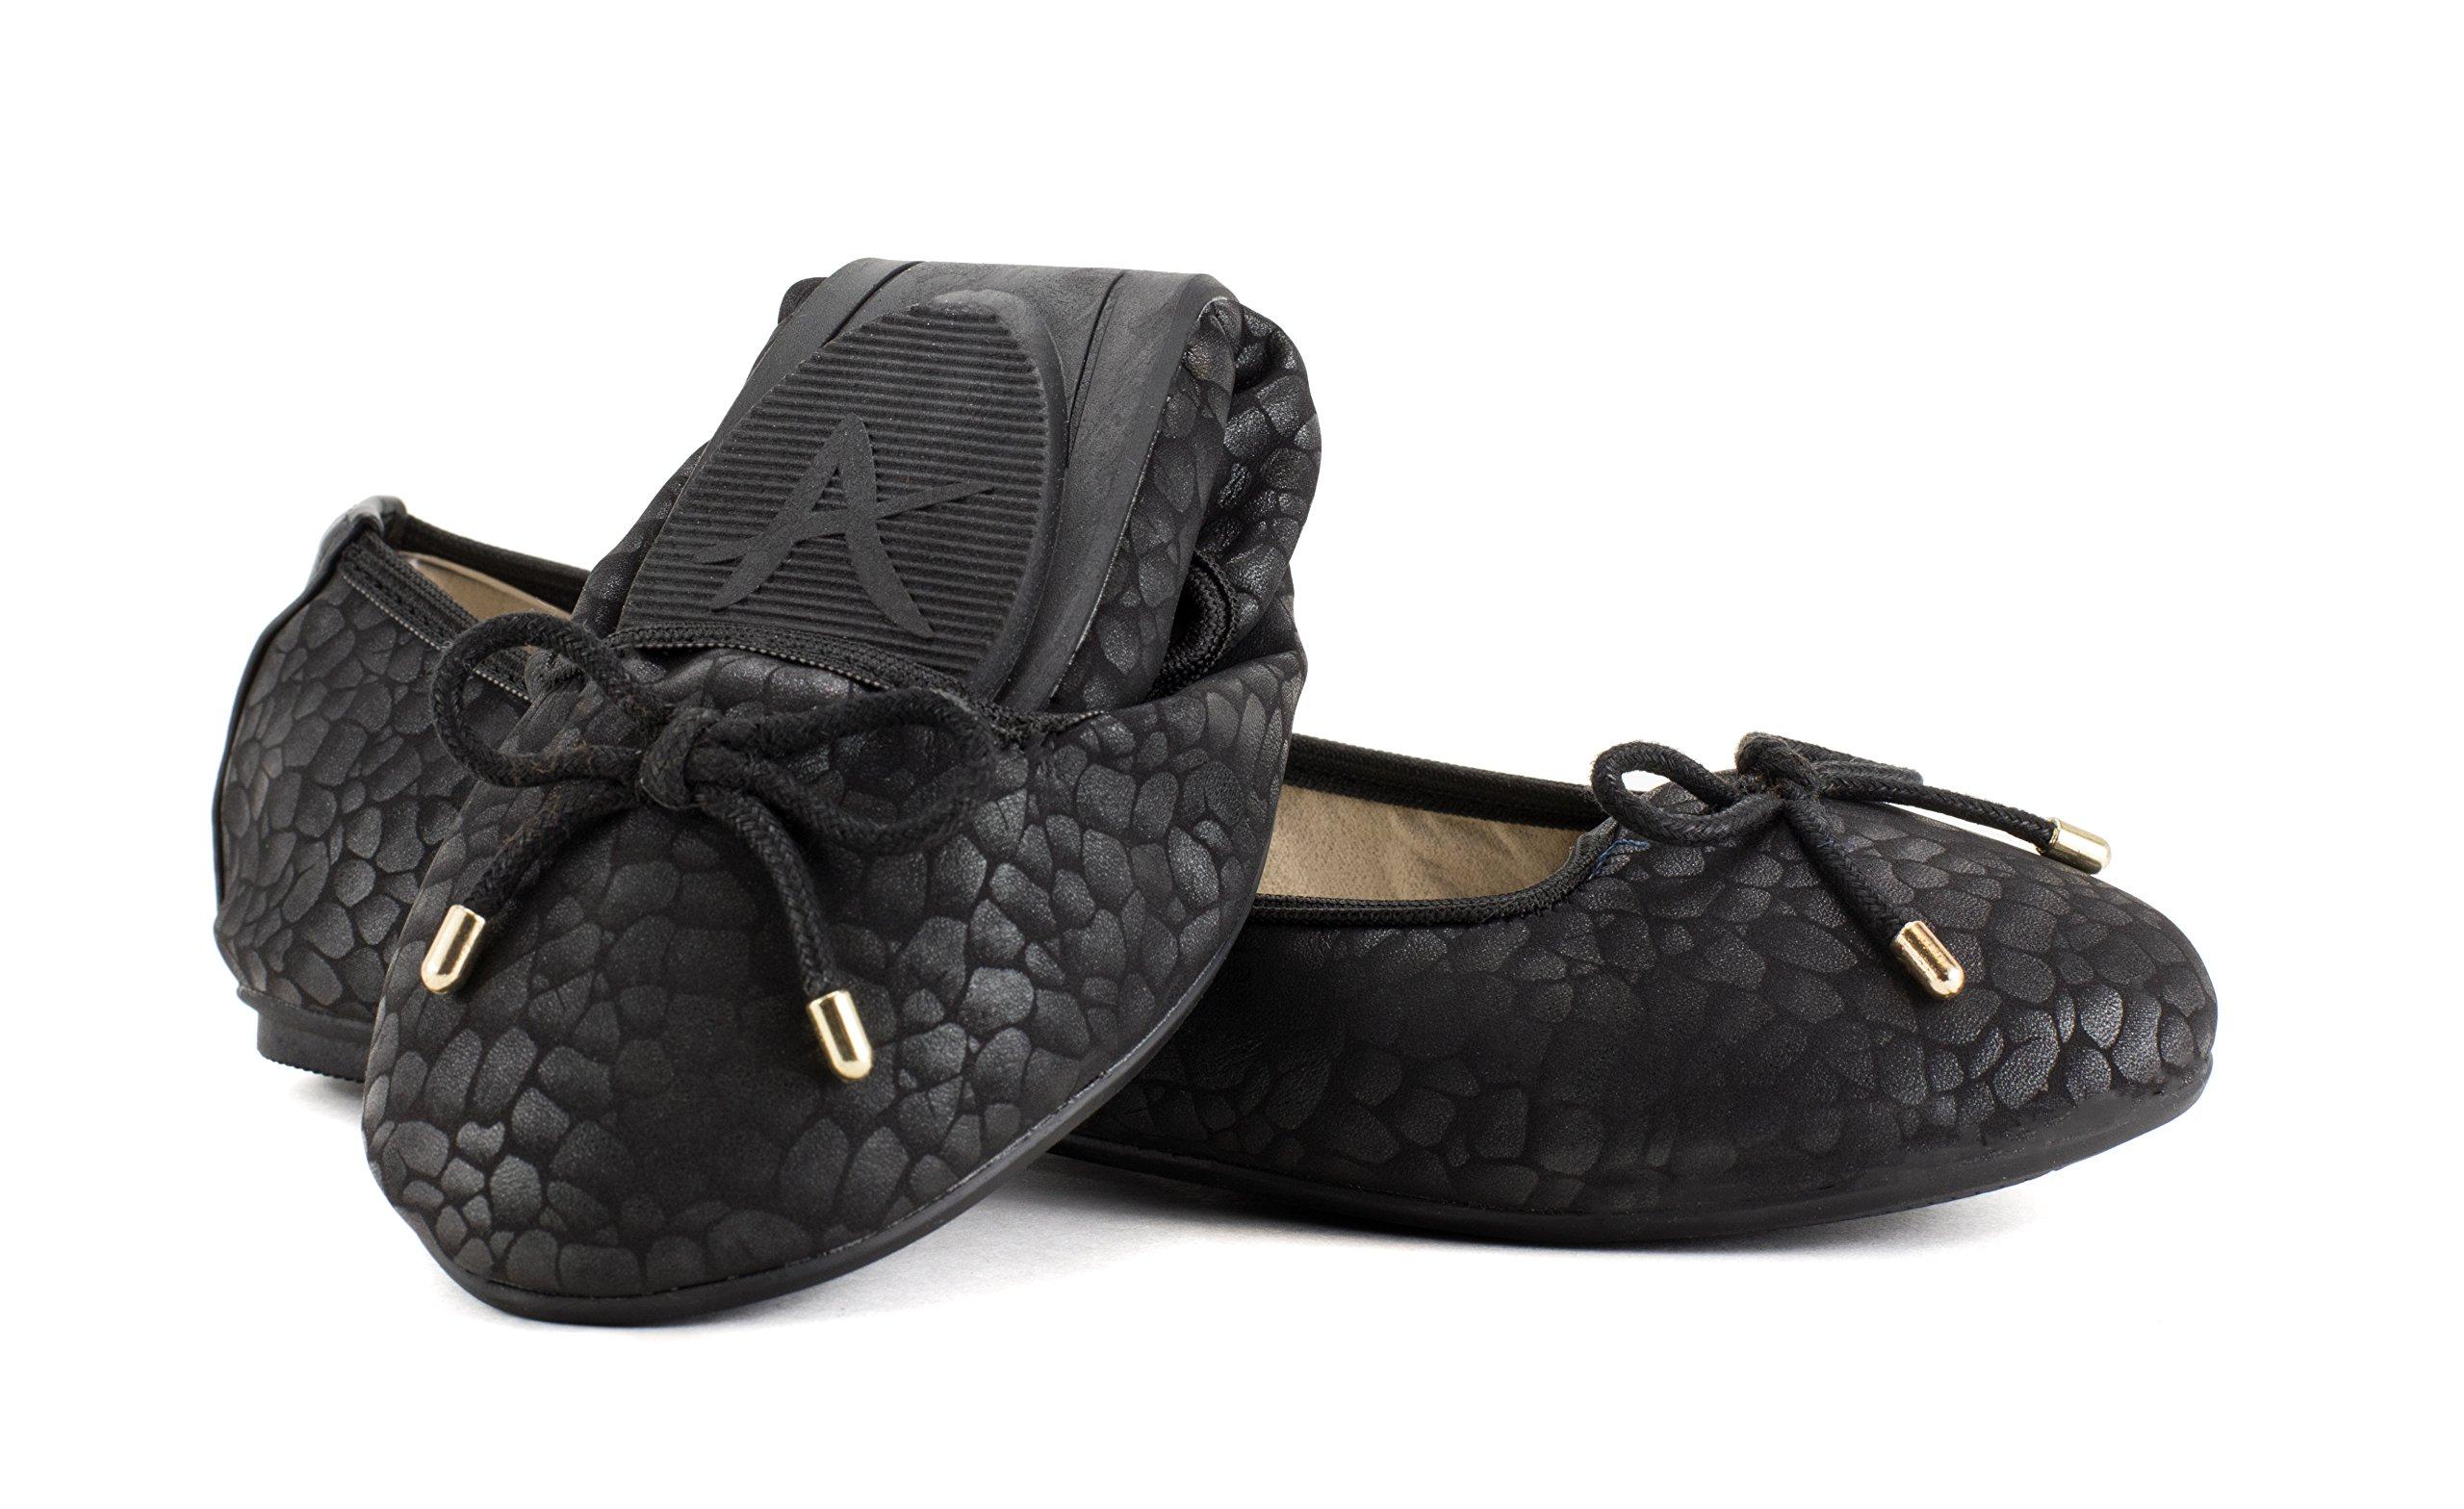 Avanti Kayla Ballet Foldable Travel Shoes with Bow Design (8)